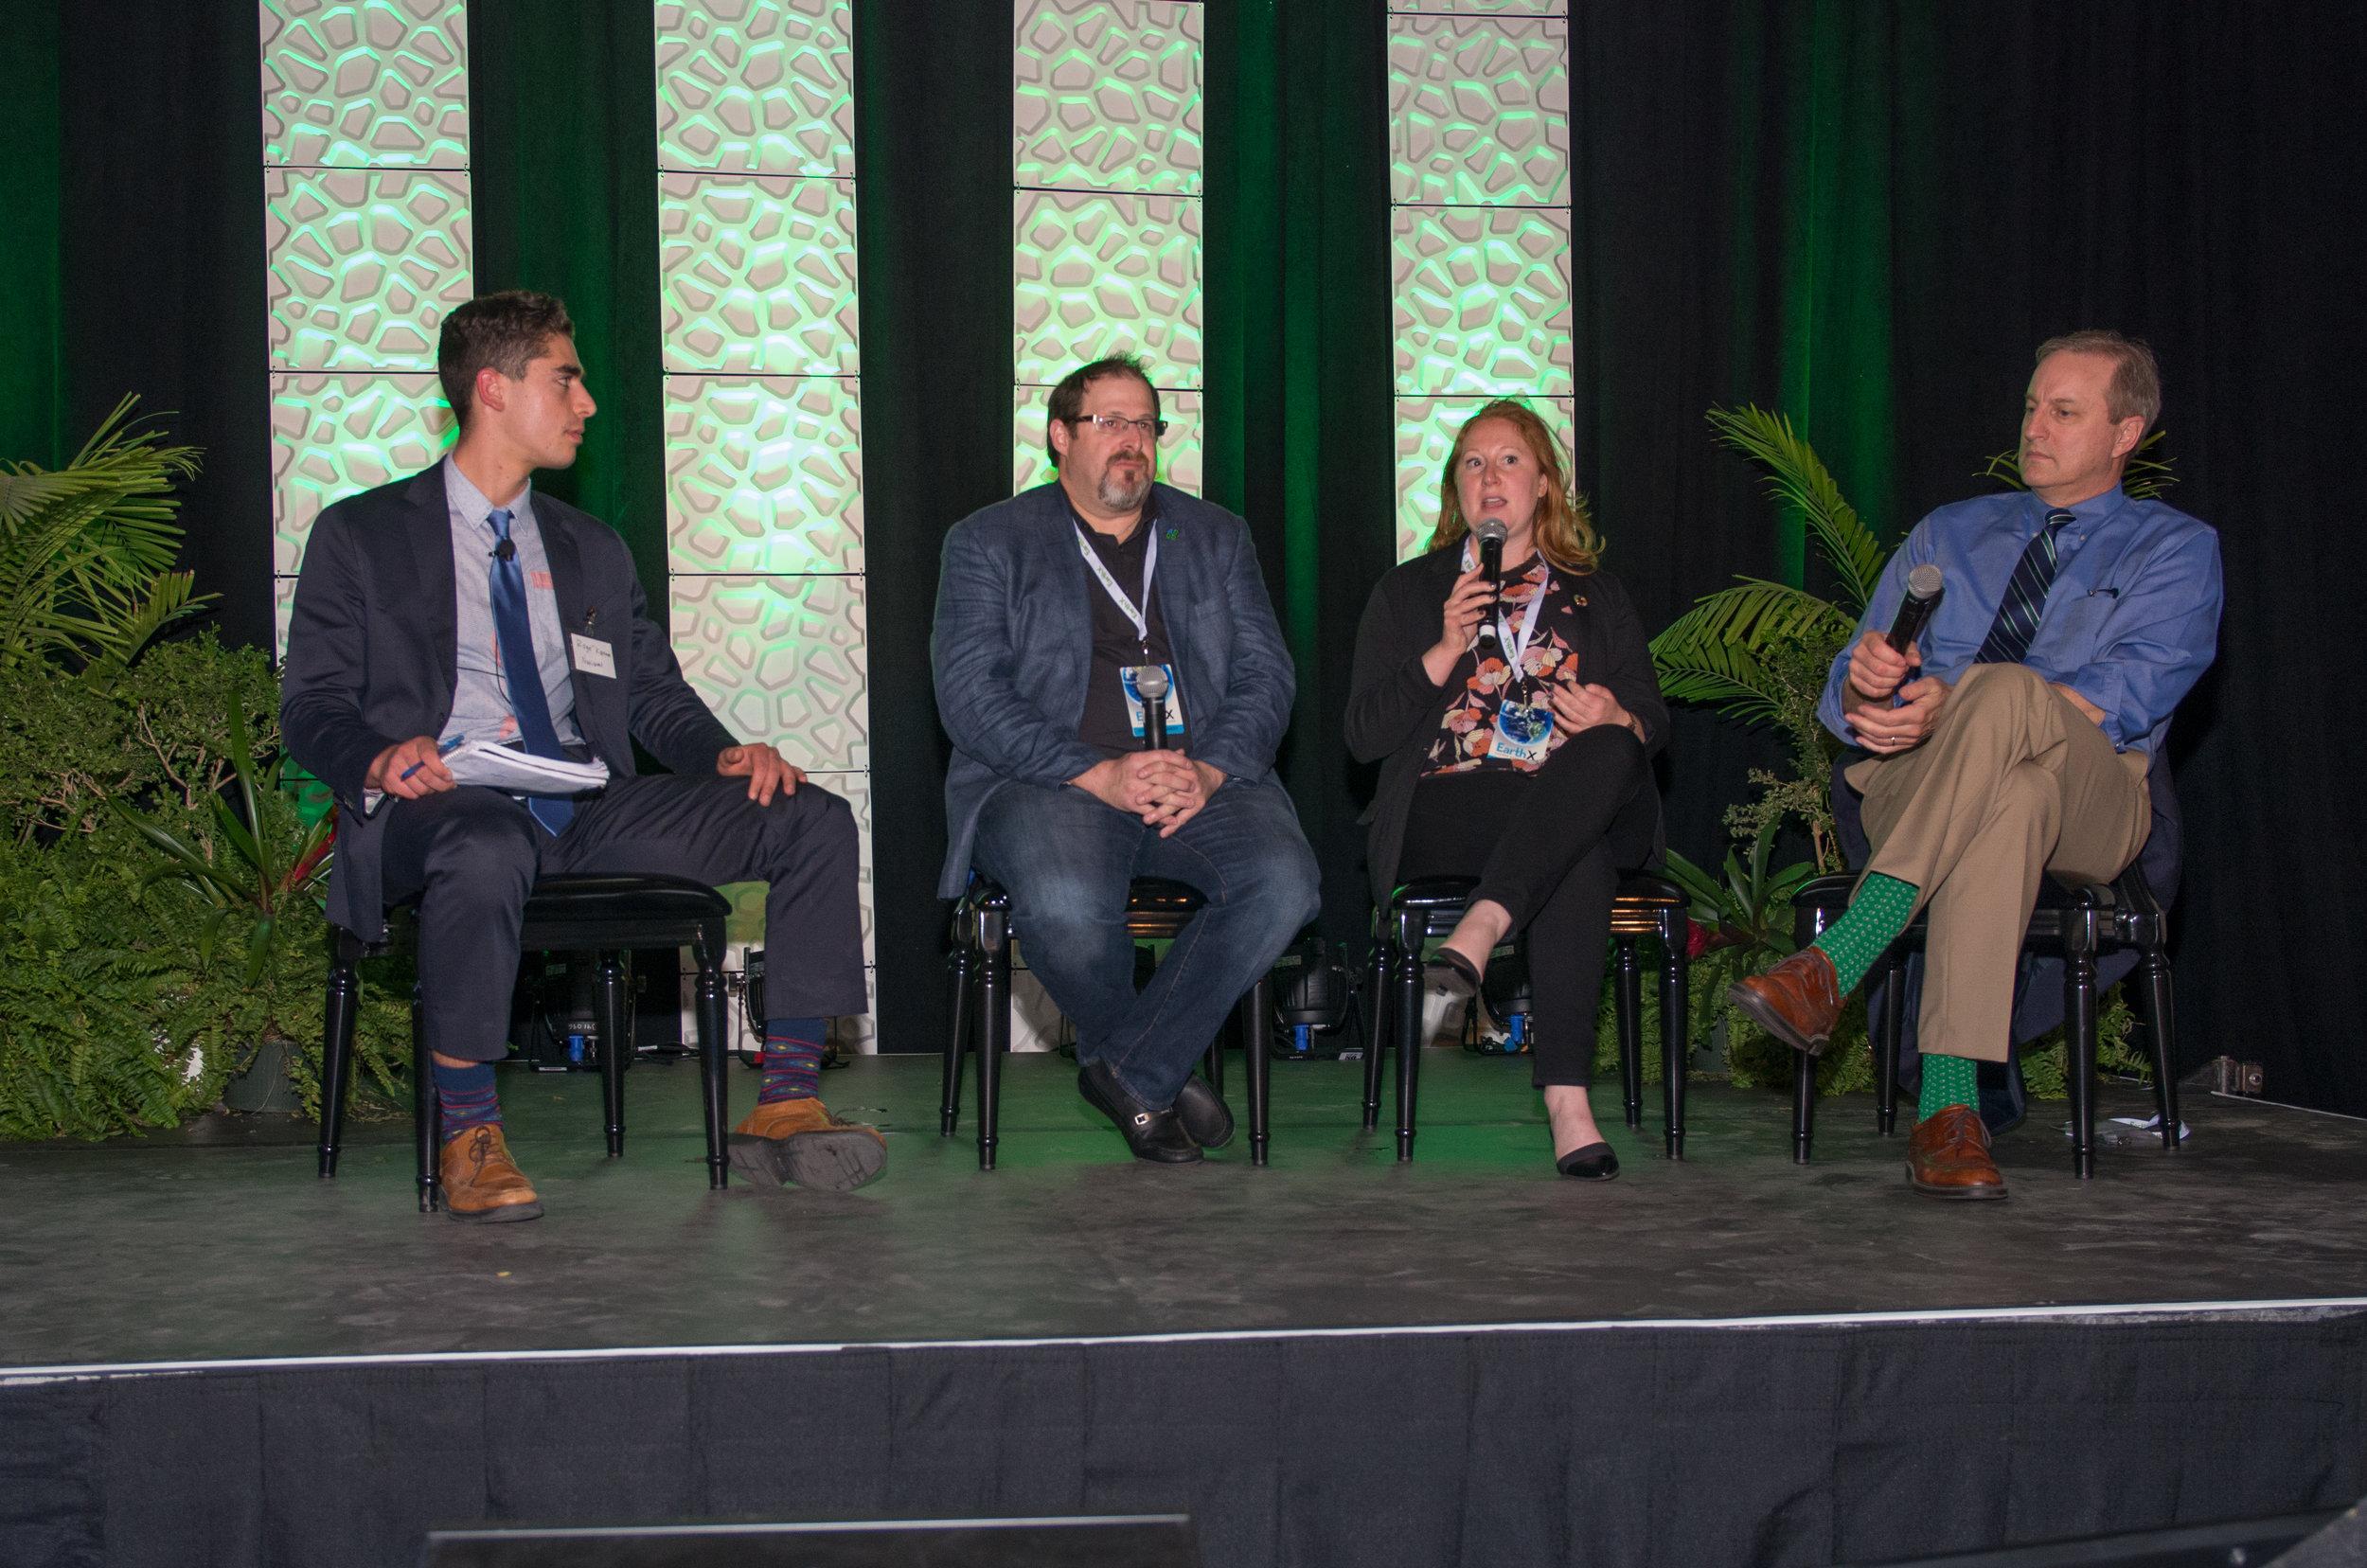 2018-04-21 - EarthX Bridge Summit Conference (SD) 178.jpg